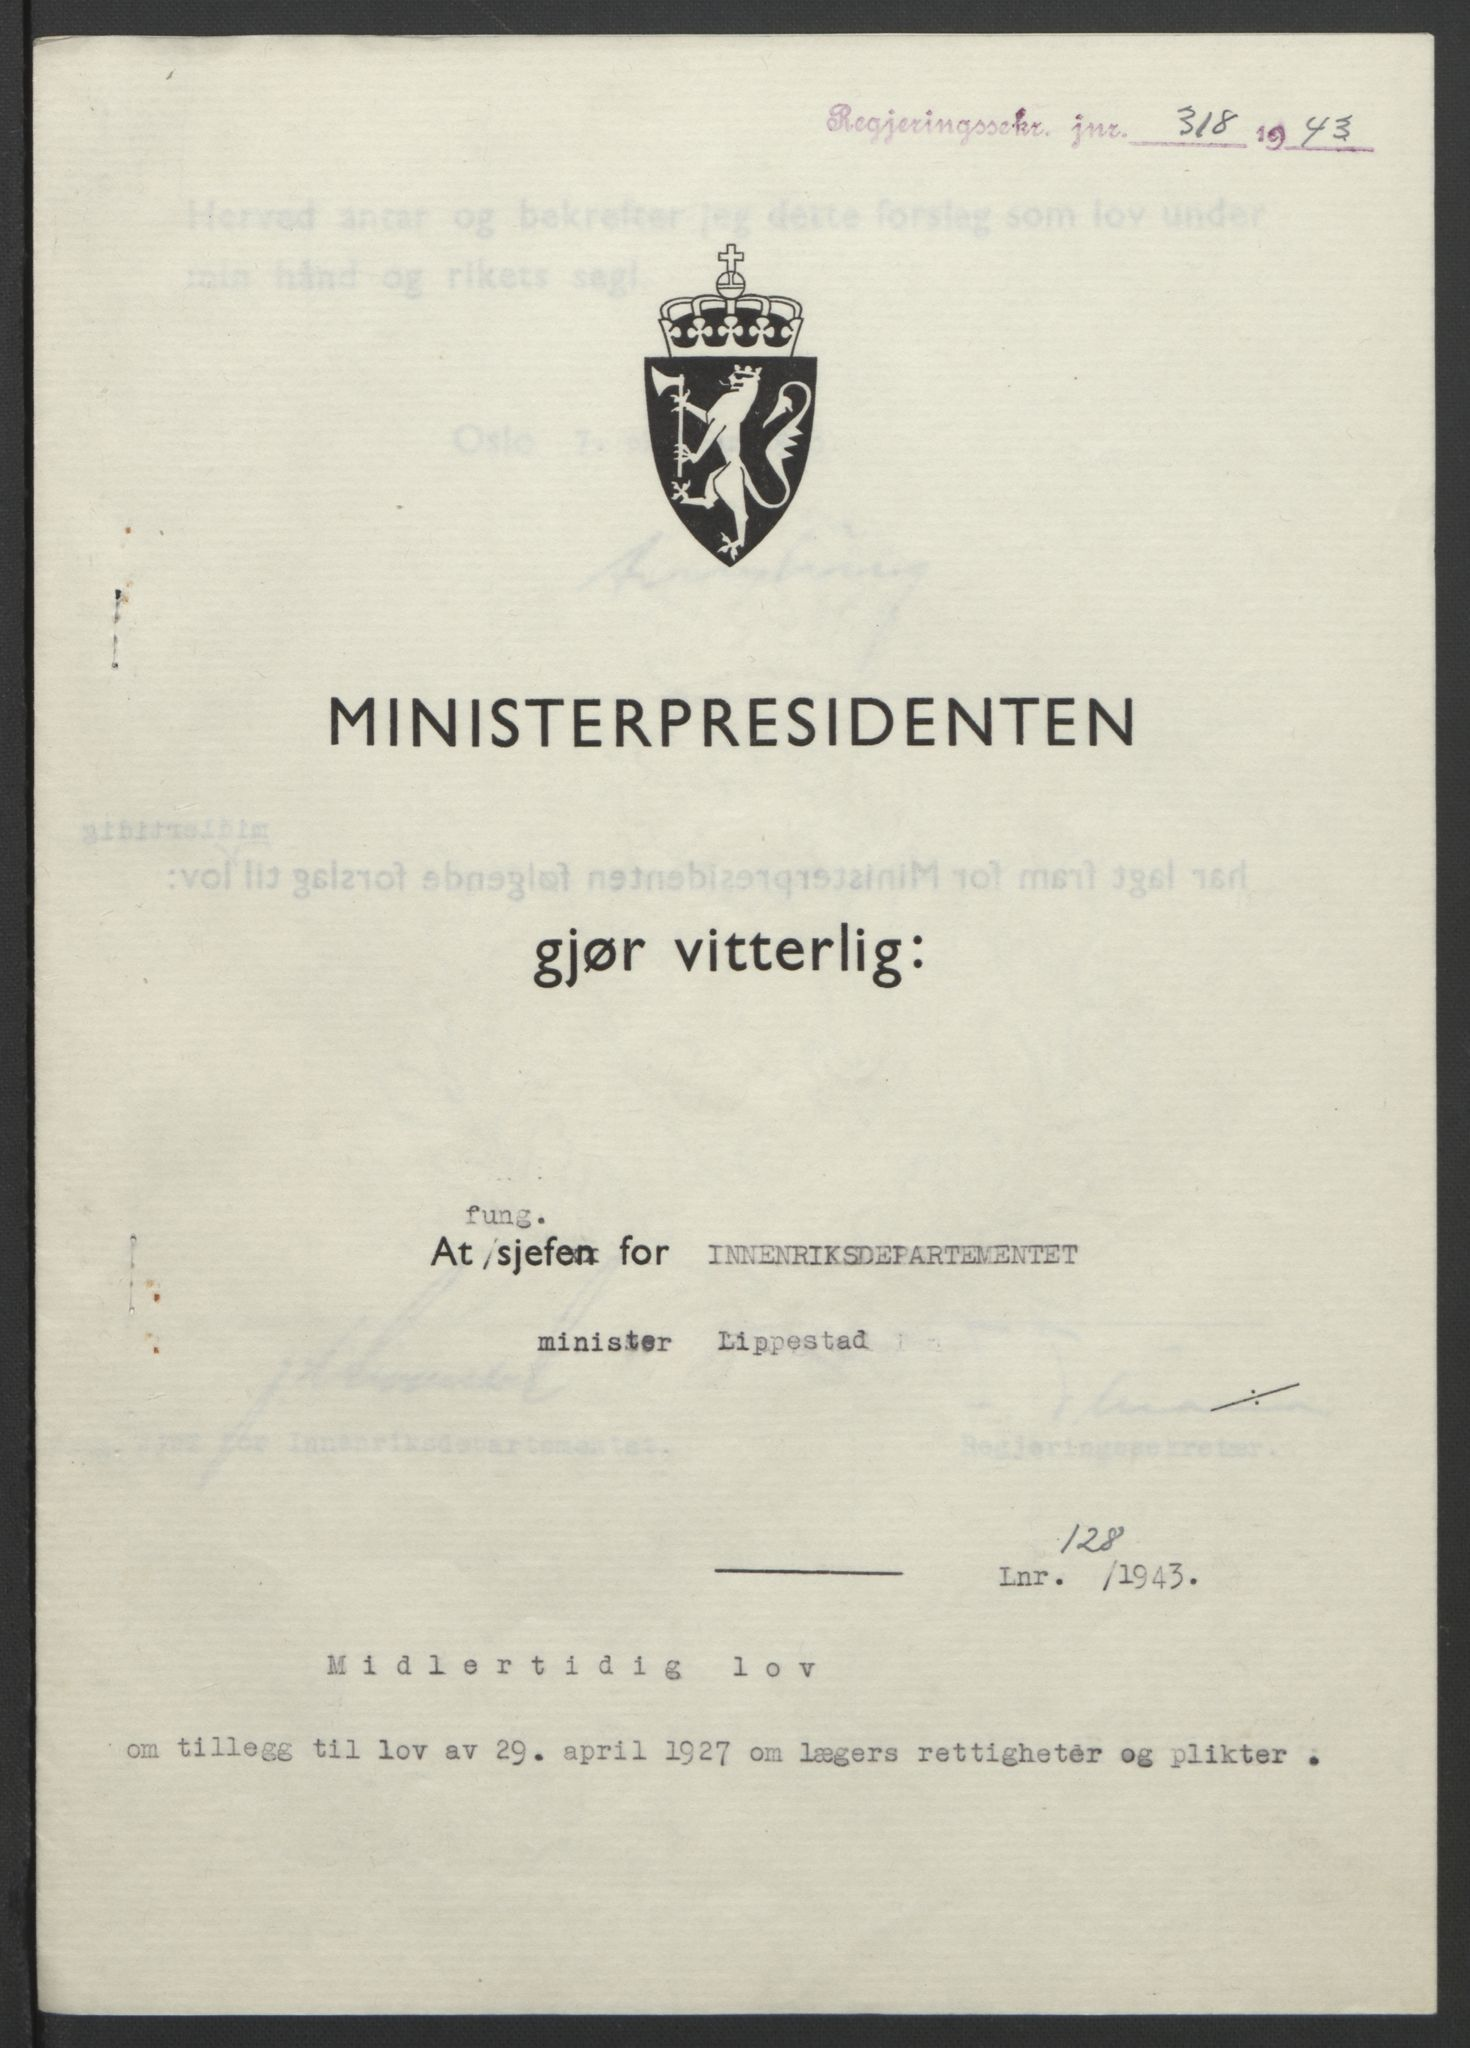 RA, NS-administrasjonen 1940-1945 (Statsrådsekretariatet, de kommisariske statsråder mm), D/Db/L0099: Lover, 1943, s. 599